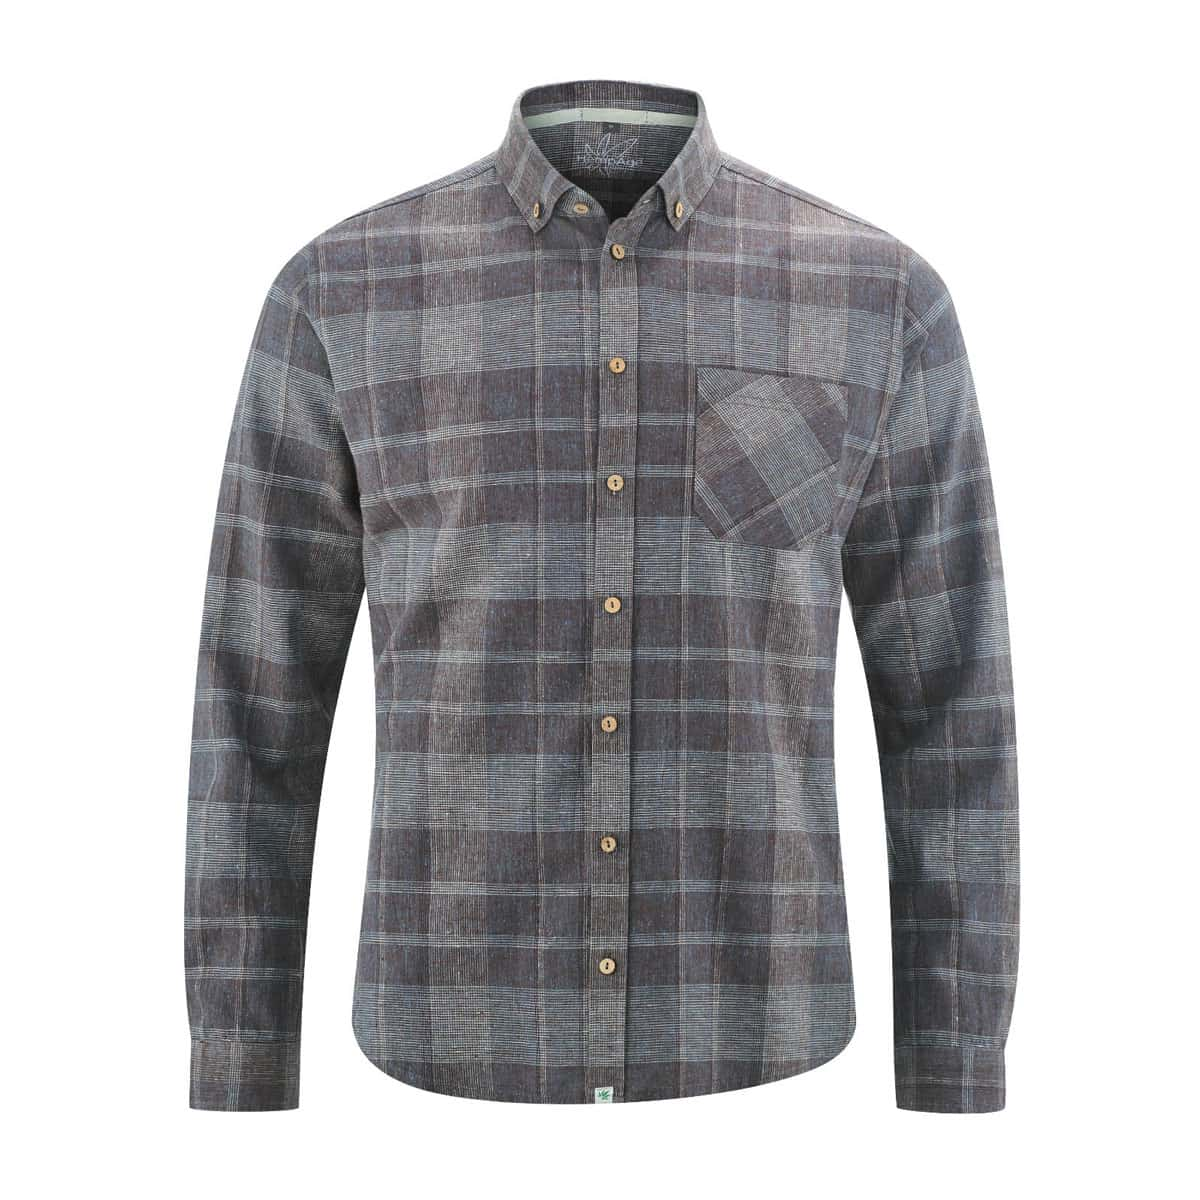 Camisa manga larga hombre a cuadros gris